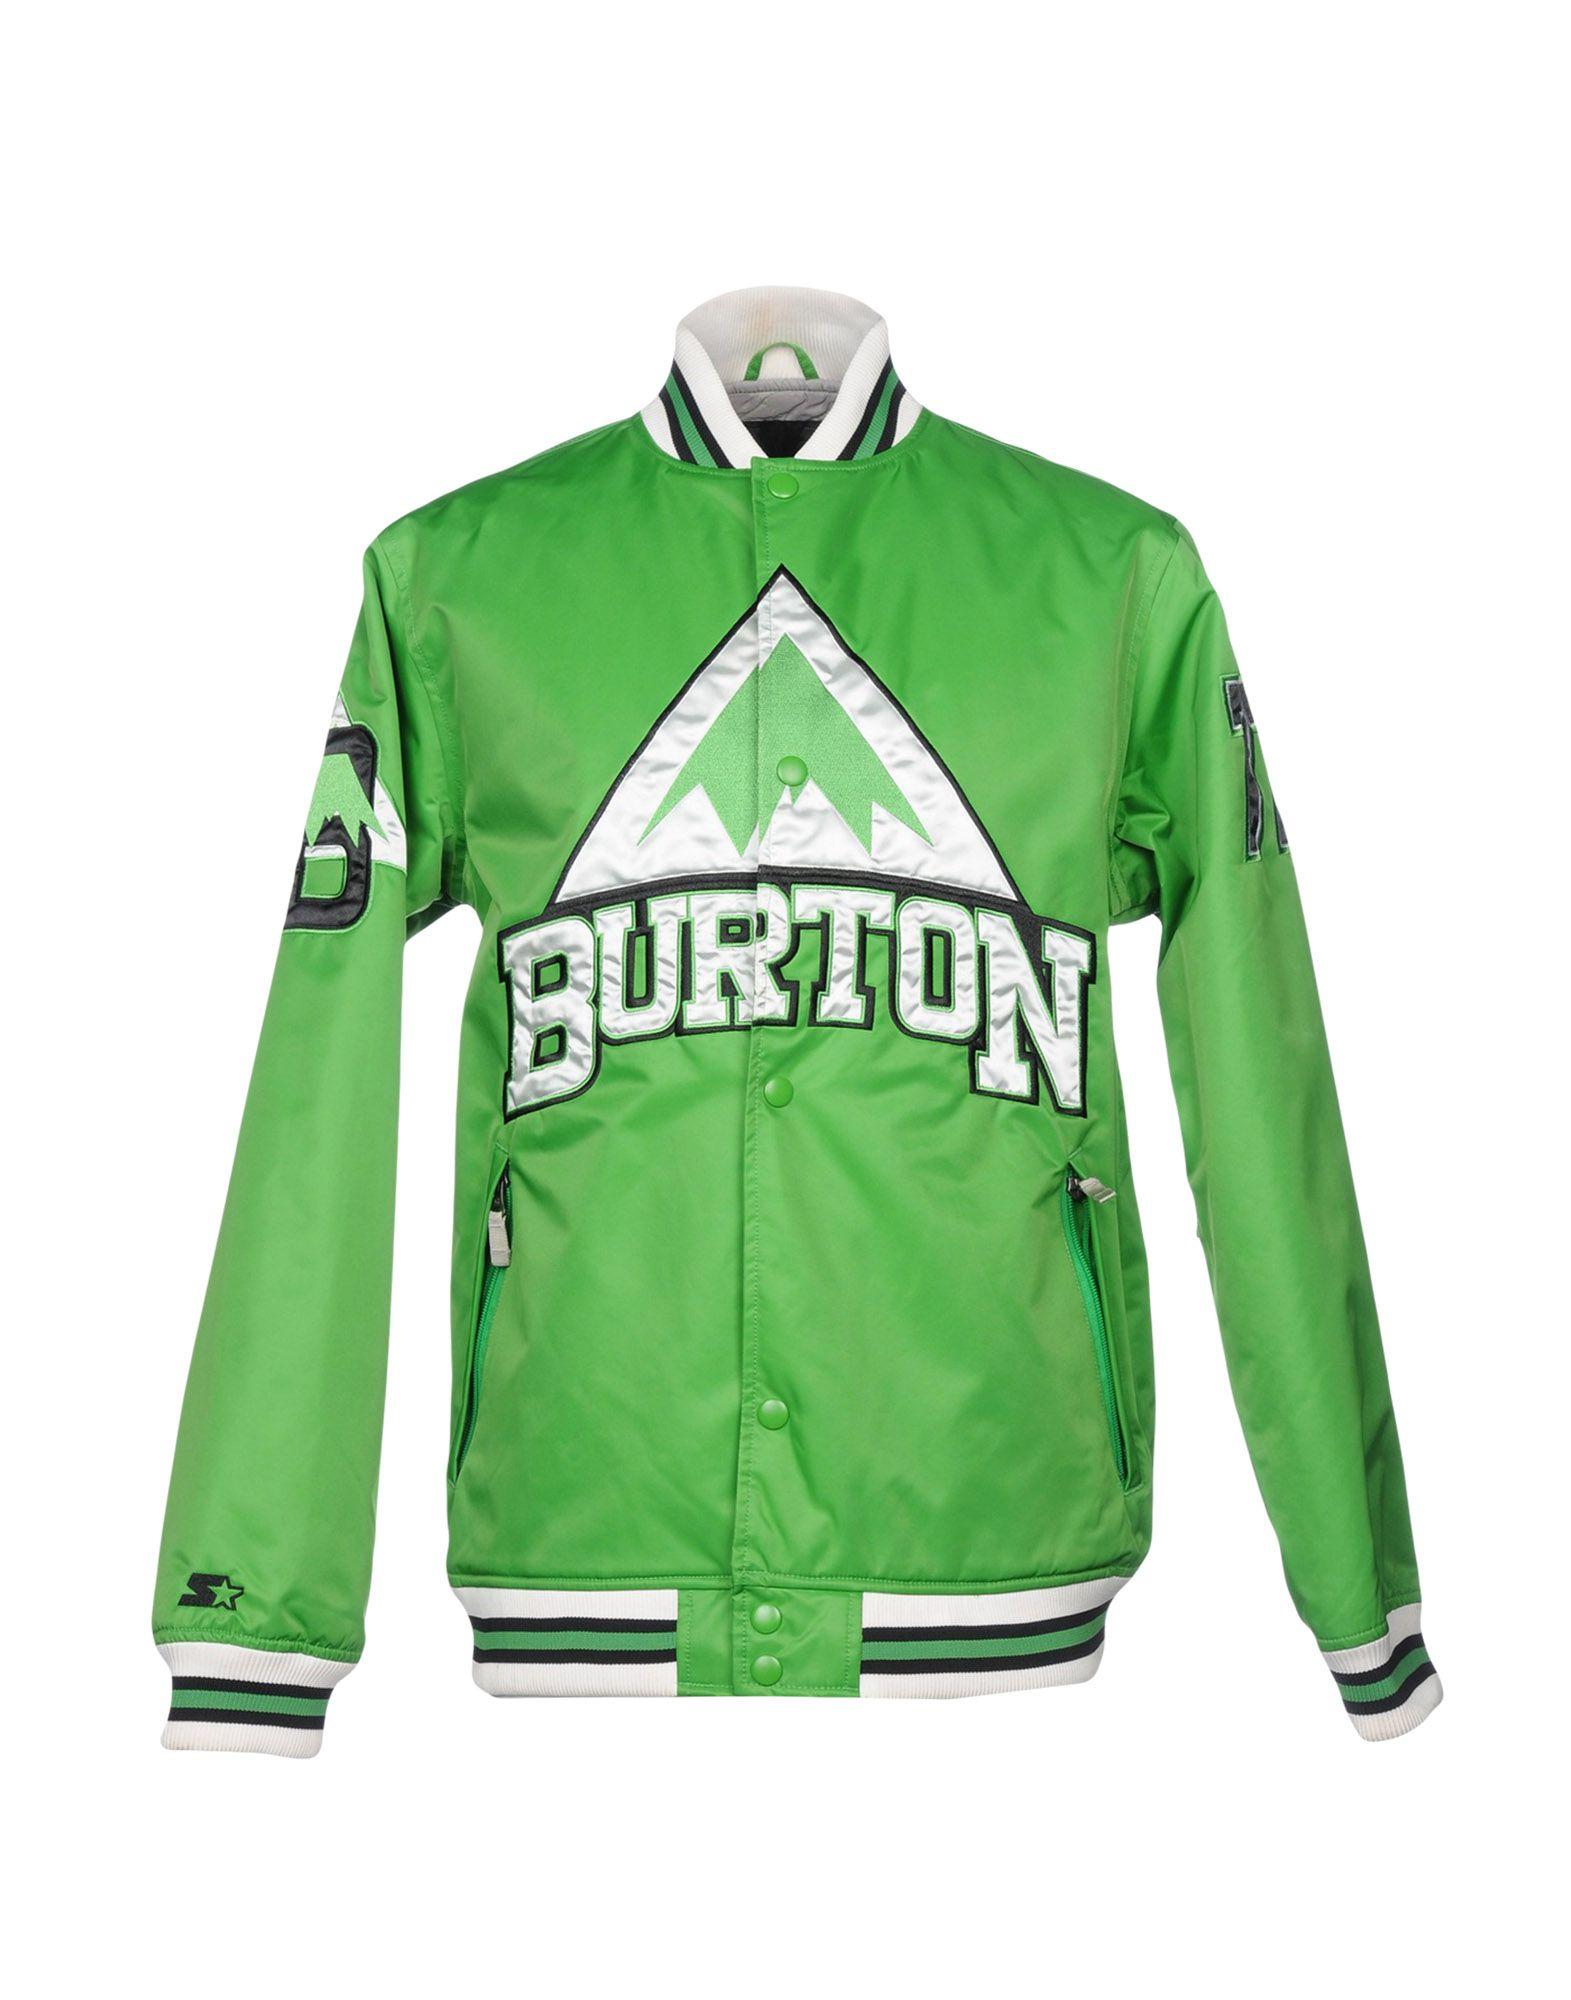 BURTON Bomber in Green